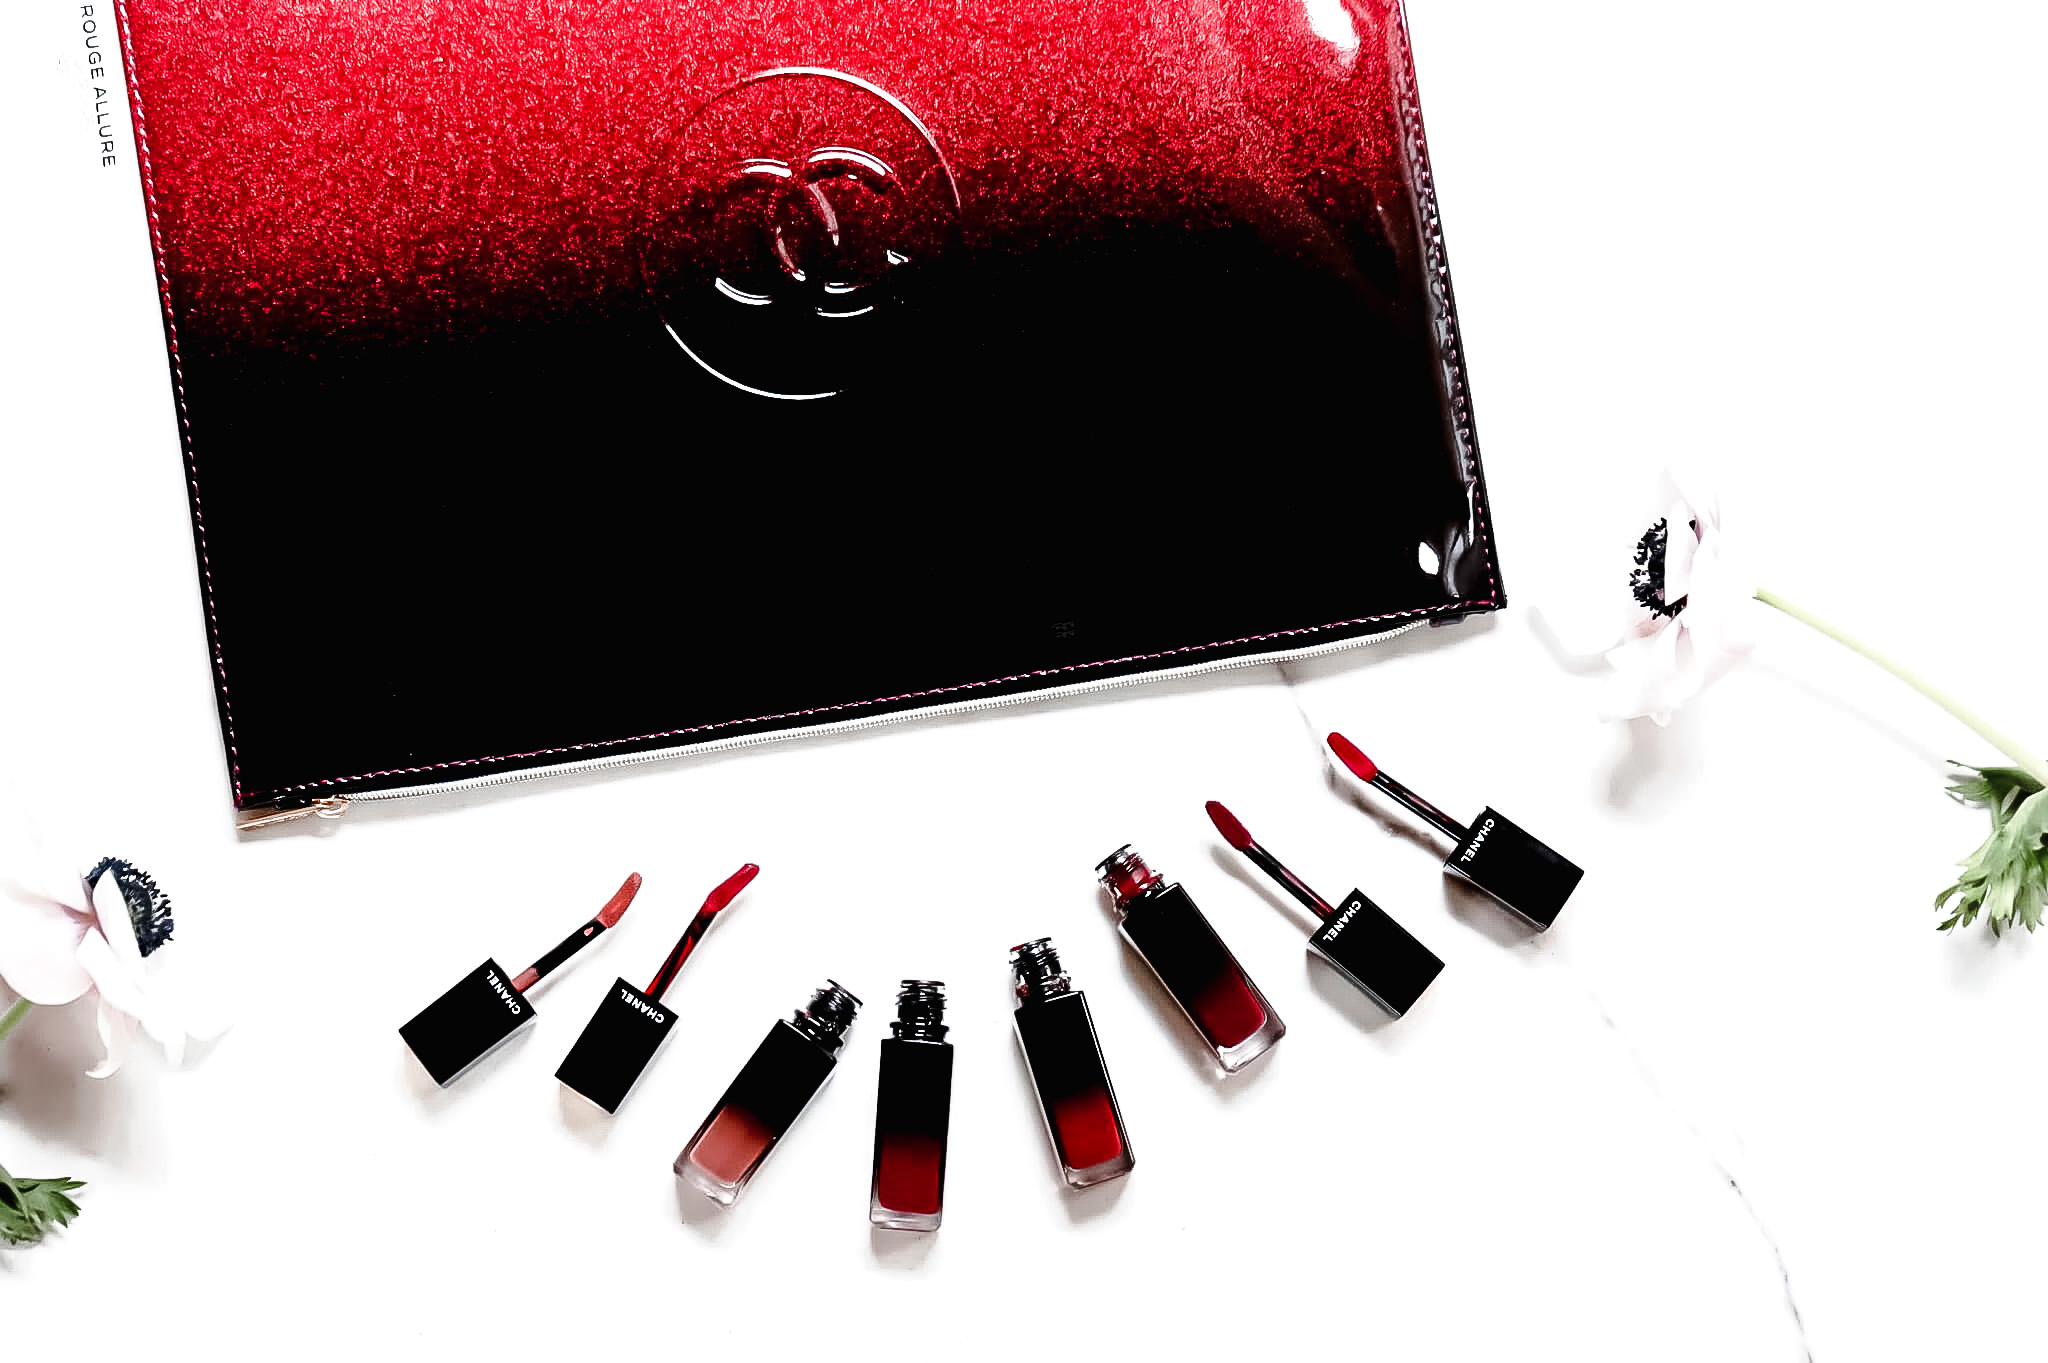 Chanel Rouge Allure Laque 62 Still 72 Iconique 79 Eternité 80 Timeless swatch